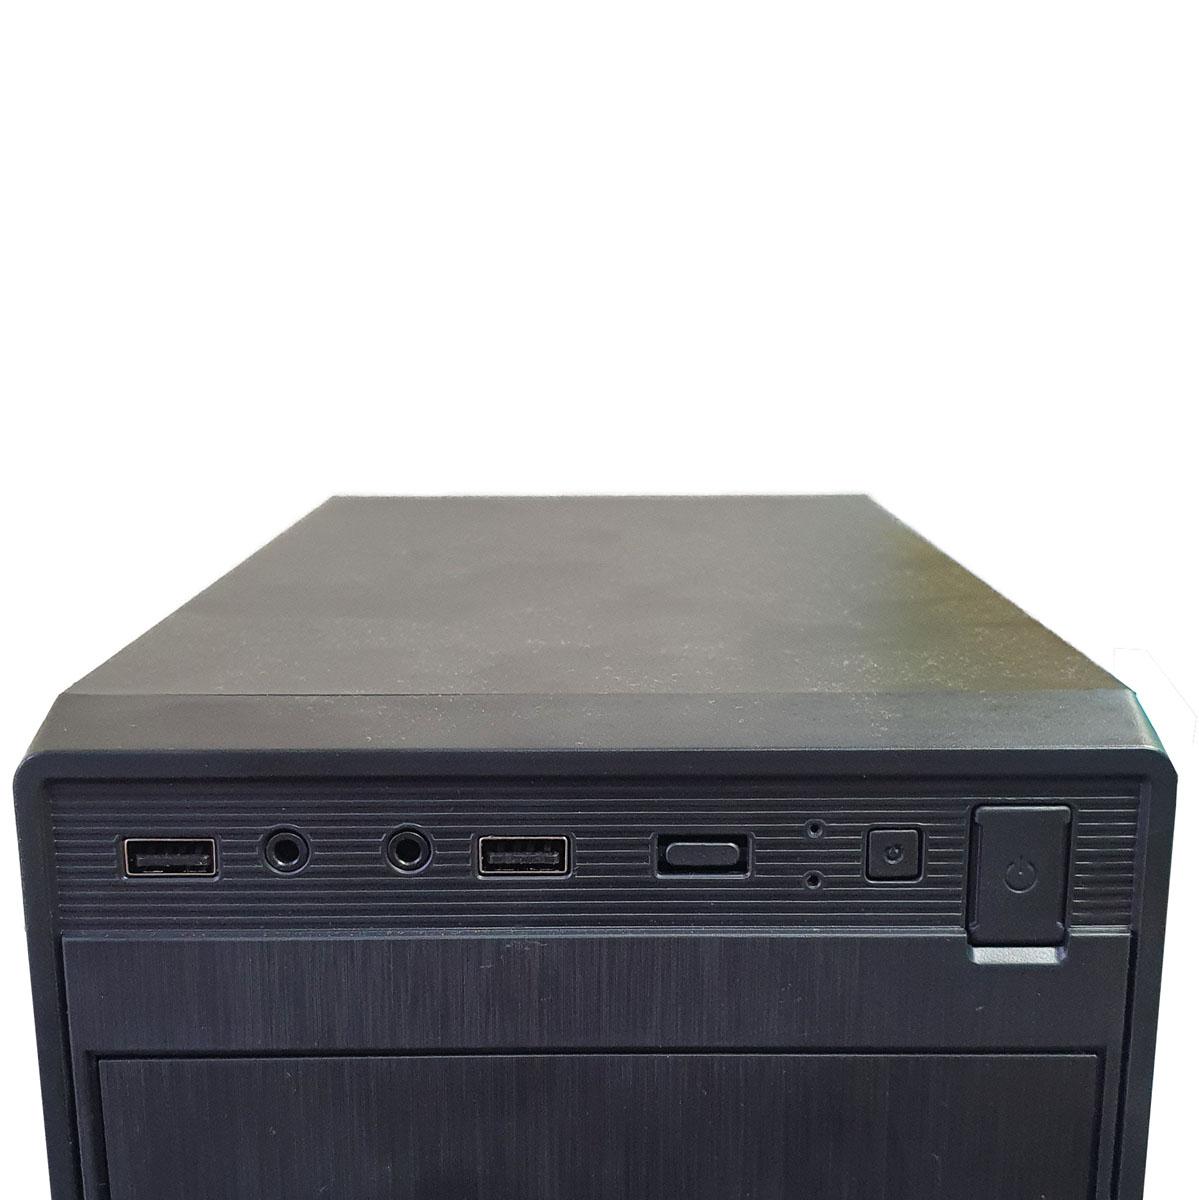 Computador CPU Home, Intel Dual Core J1800, 4GB DDR3, SSD 120GB